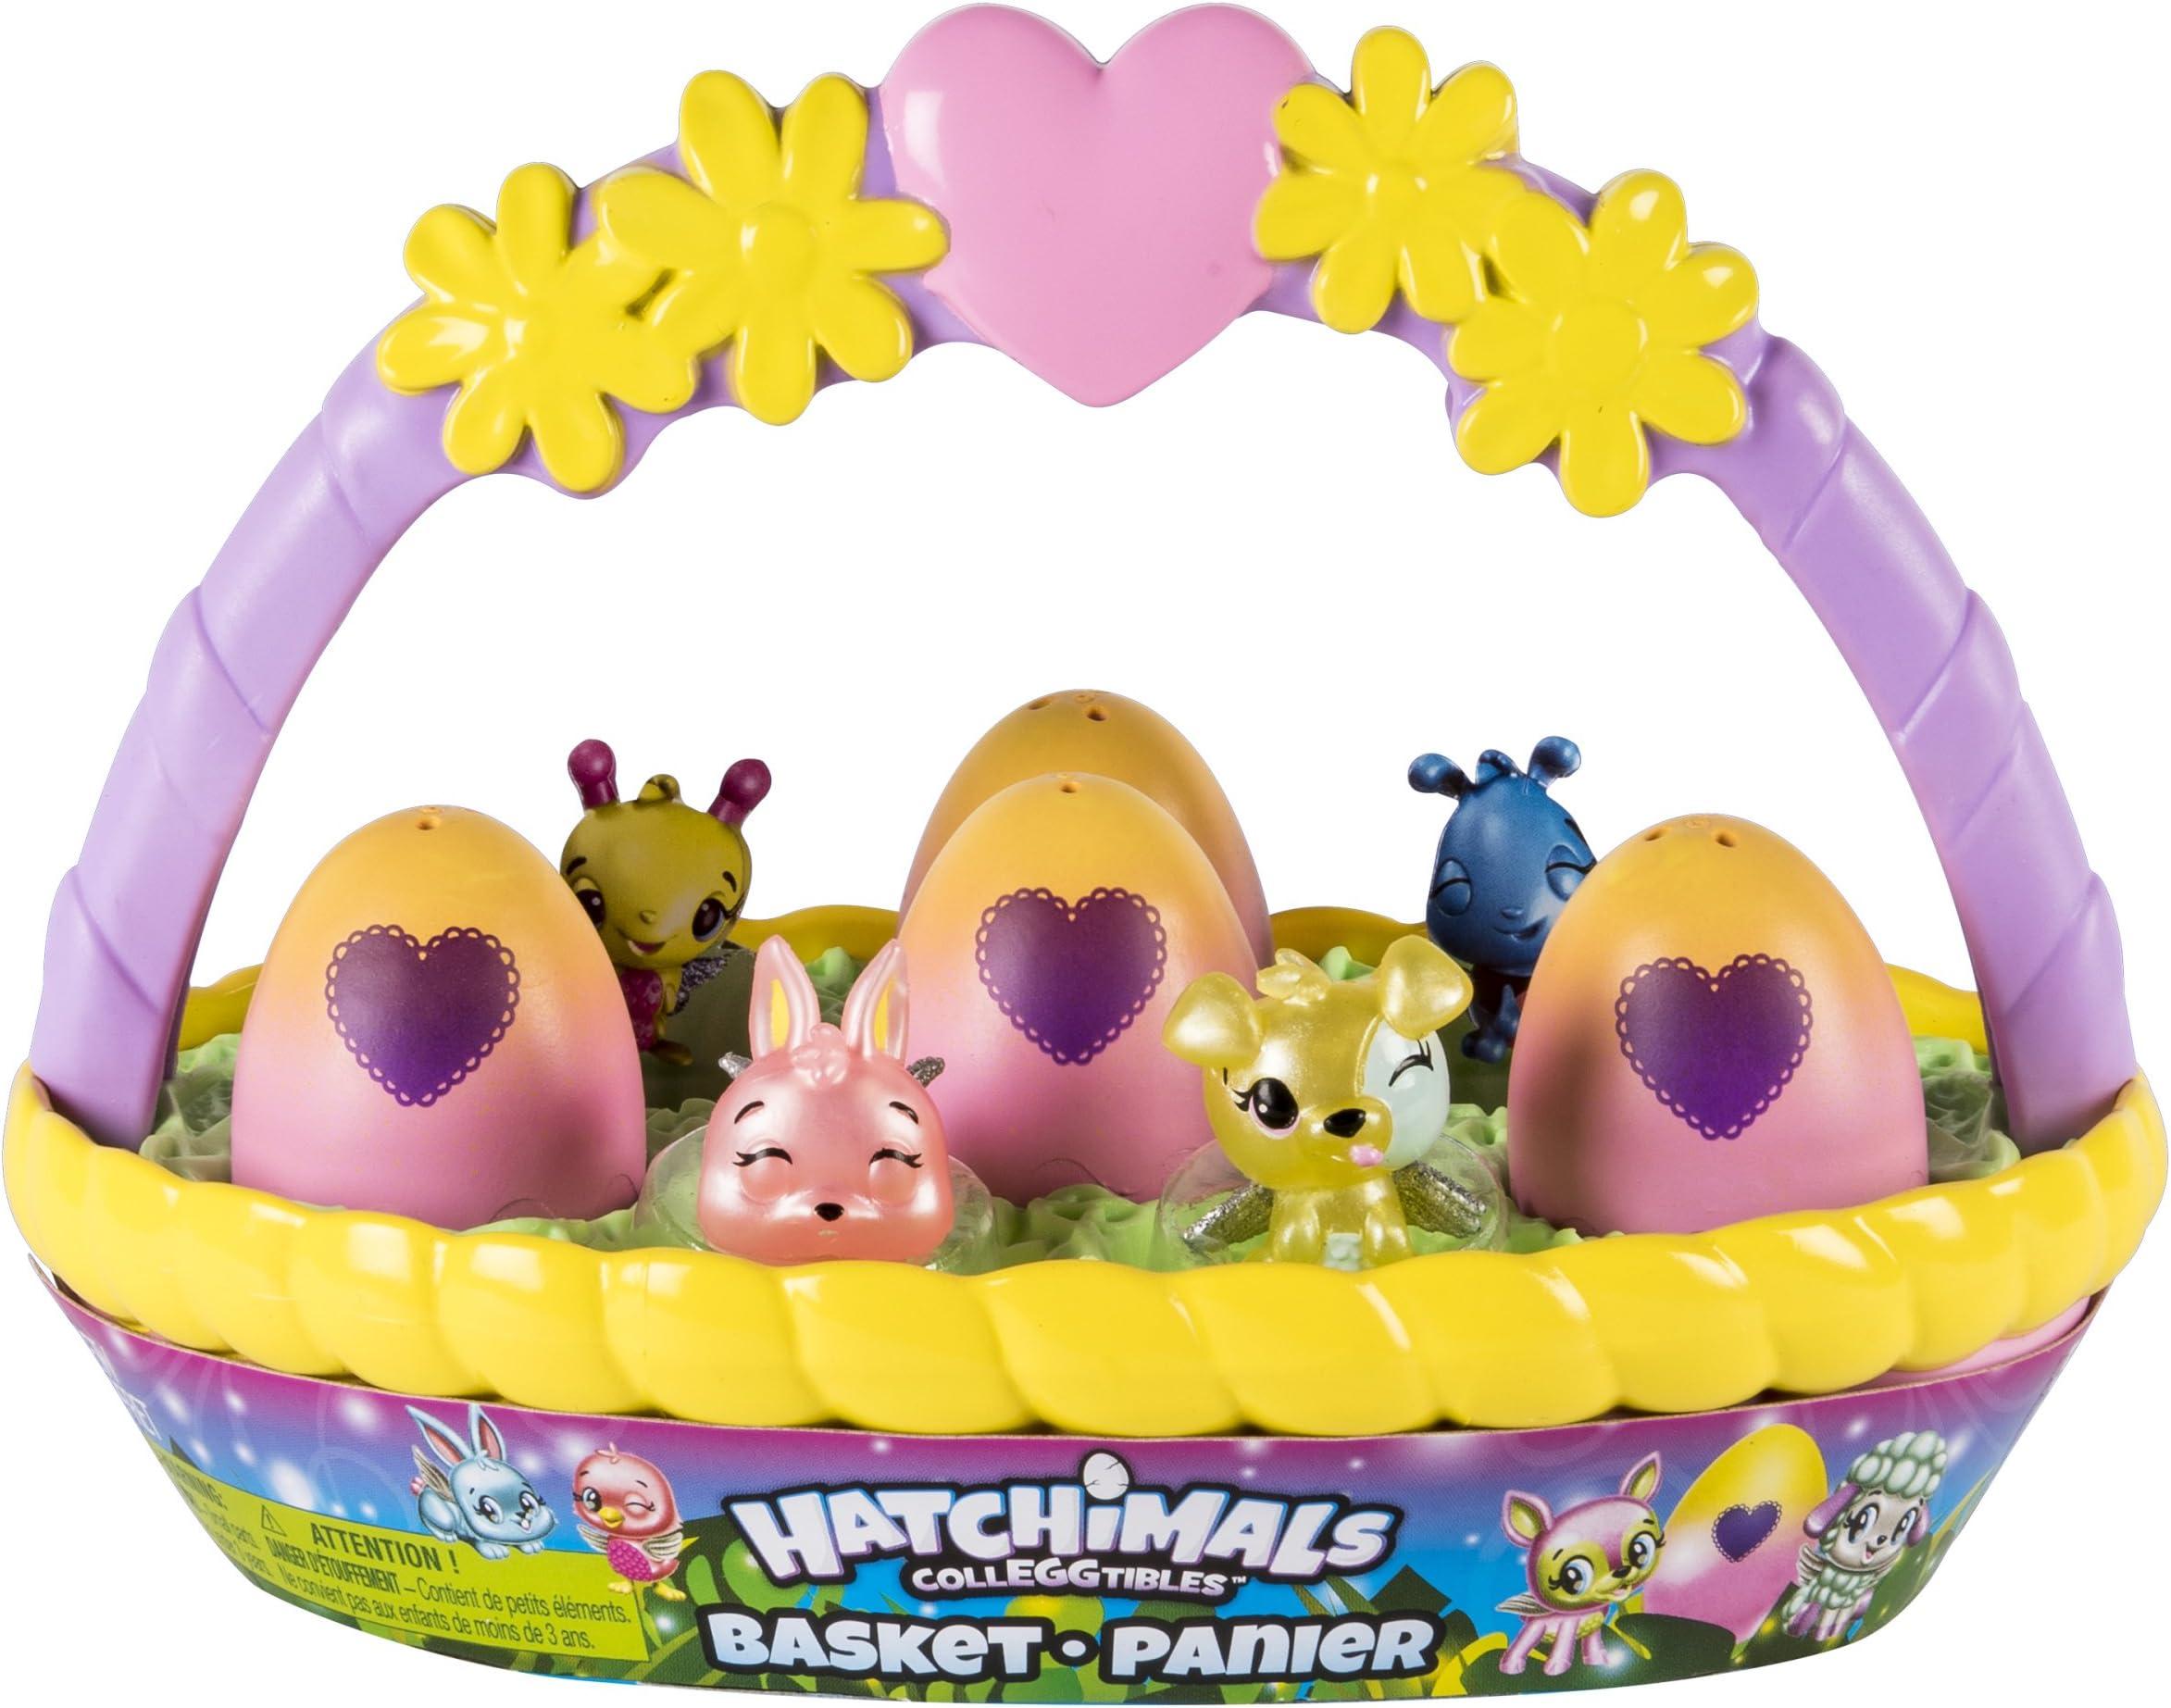 Hatchimals CollEGGtibles Easter Basket with 6 Hatchimals CollEGGtibles  sc 1 st  Amazon.com & Shop Amazon.com | Gift Baskets